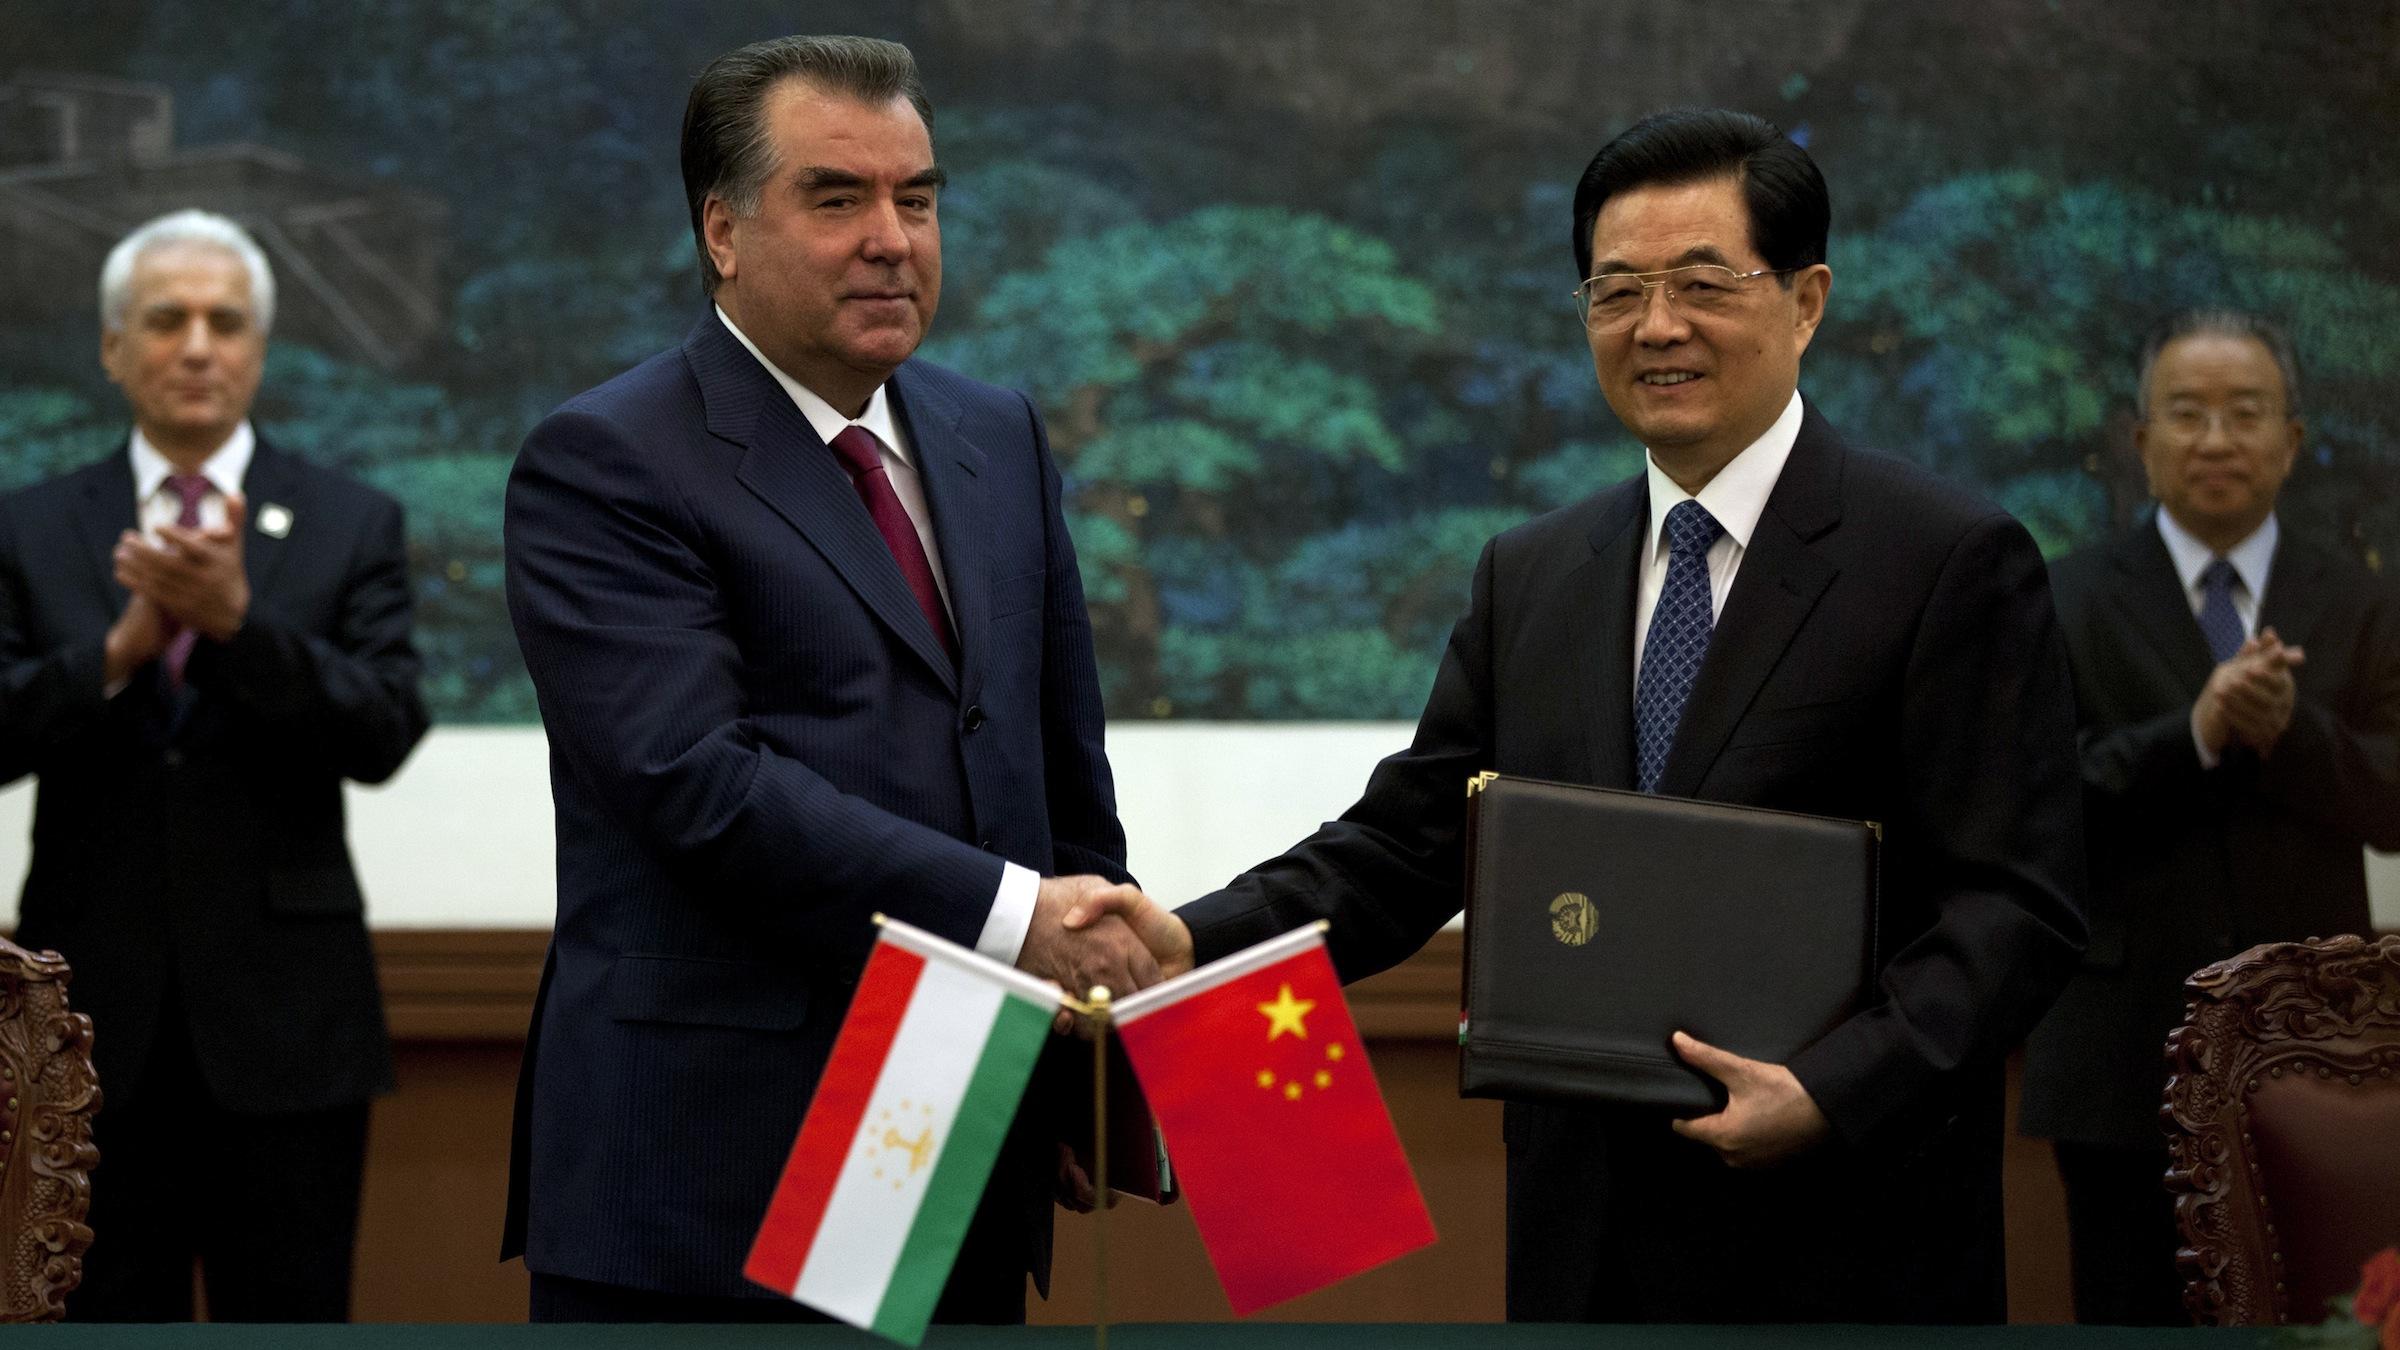 Tajikistan president Emomali Rakhmon and Chinese president Hu Jintao